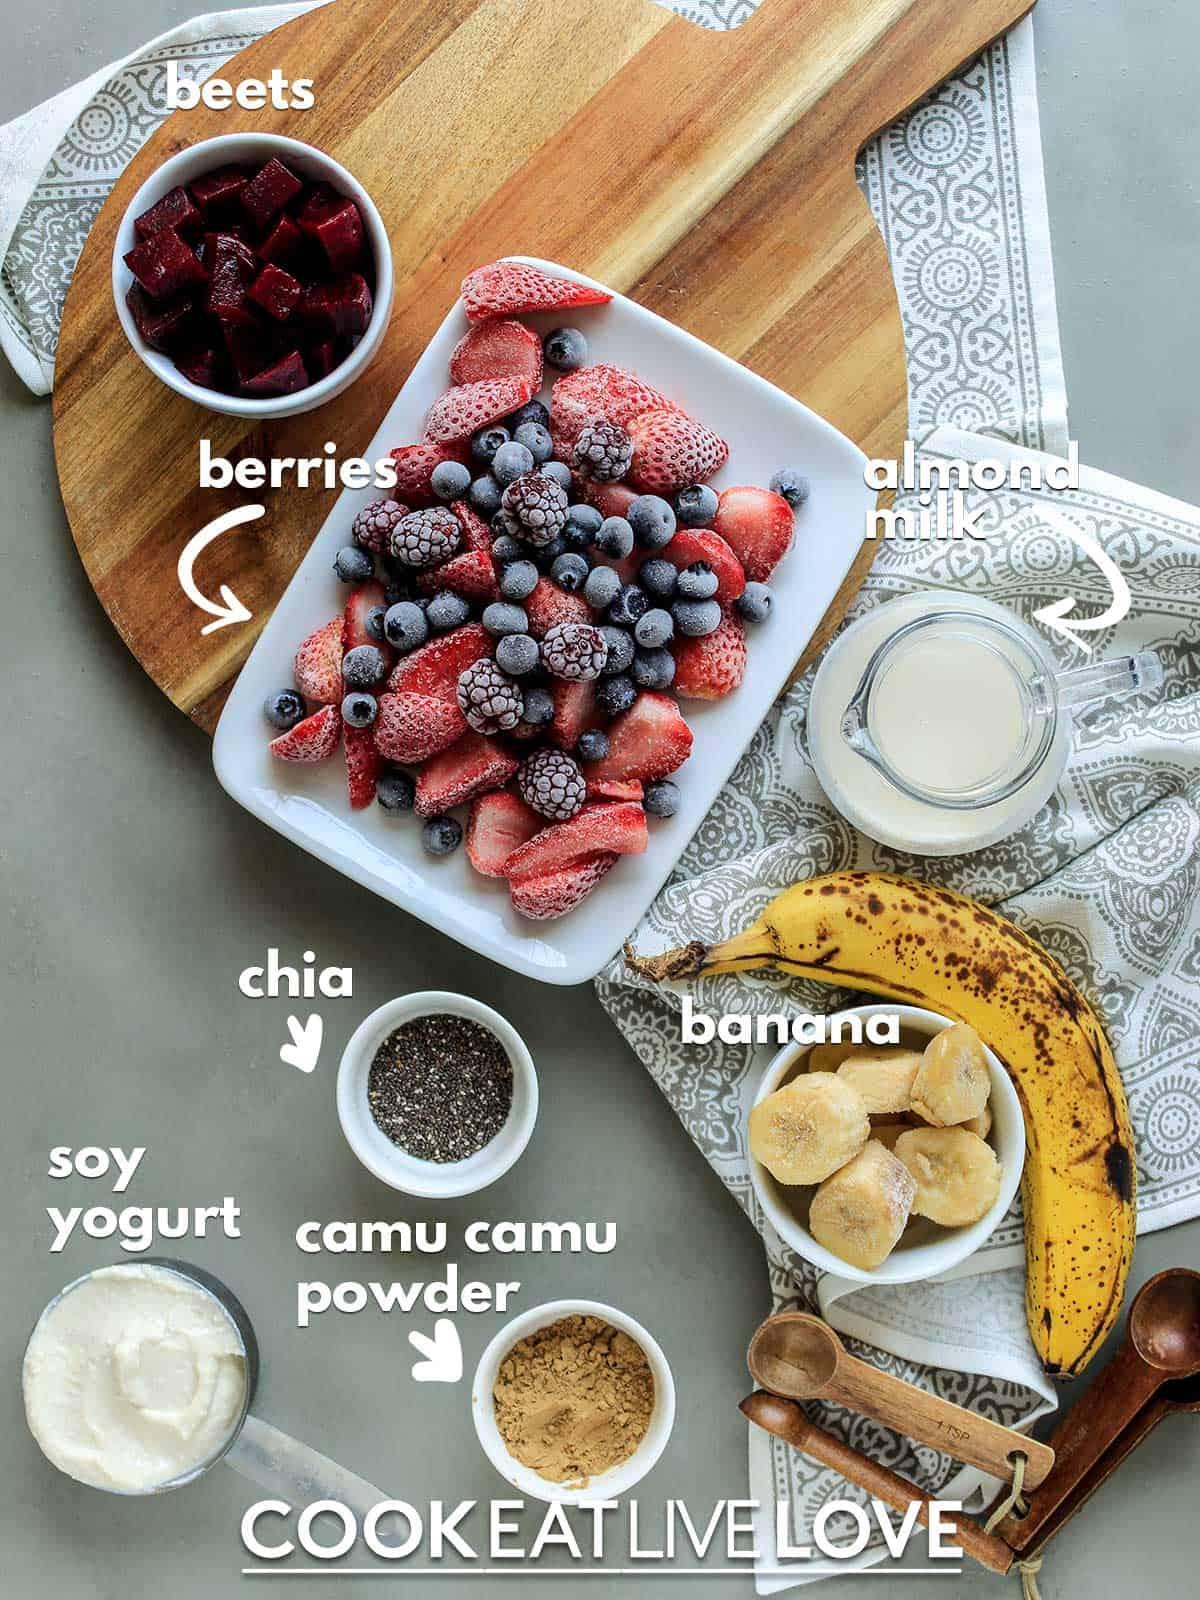 Ingredients to make camu camu smoothie on cutting board